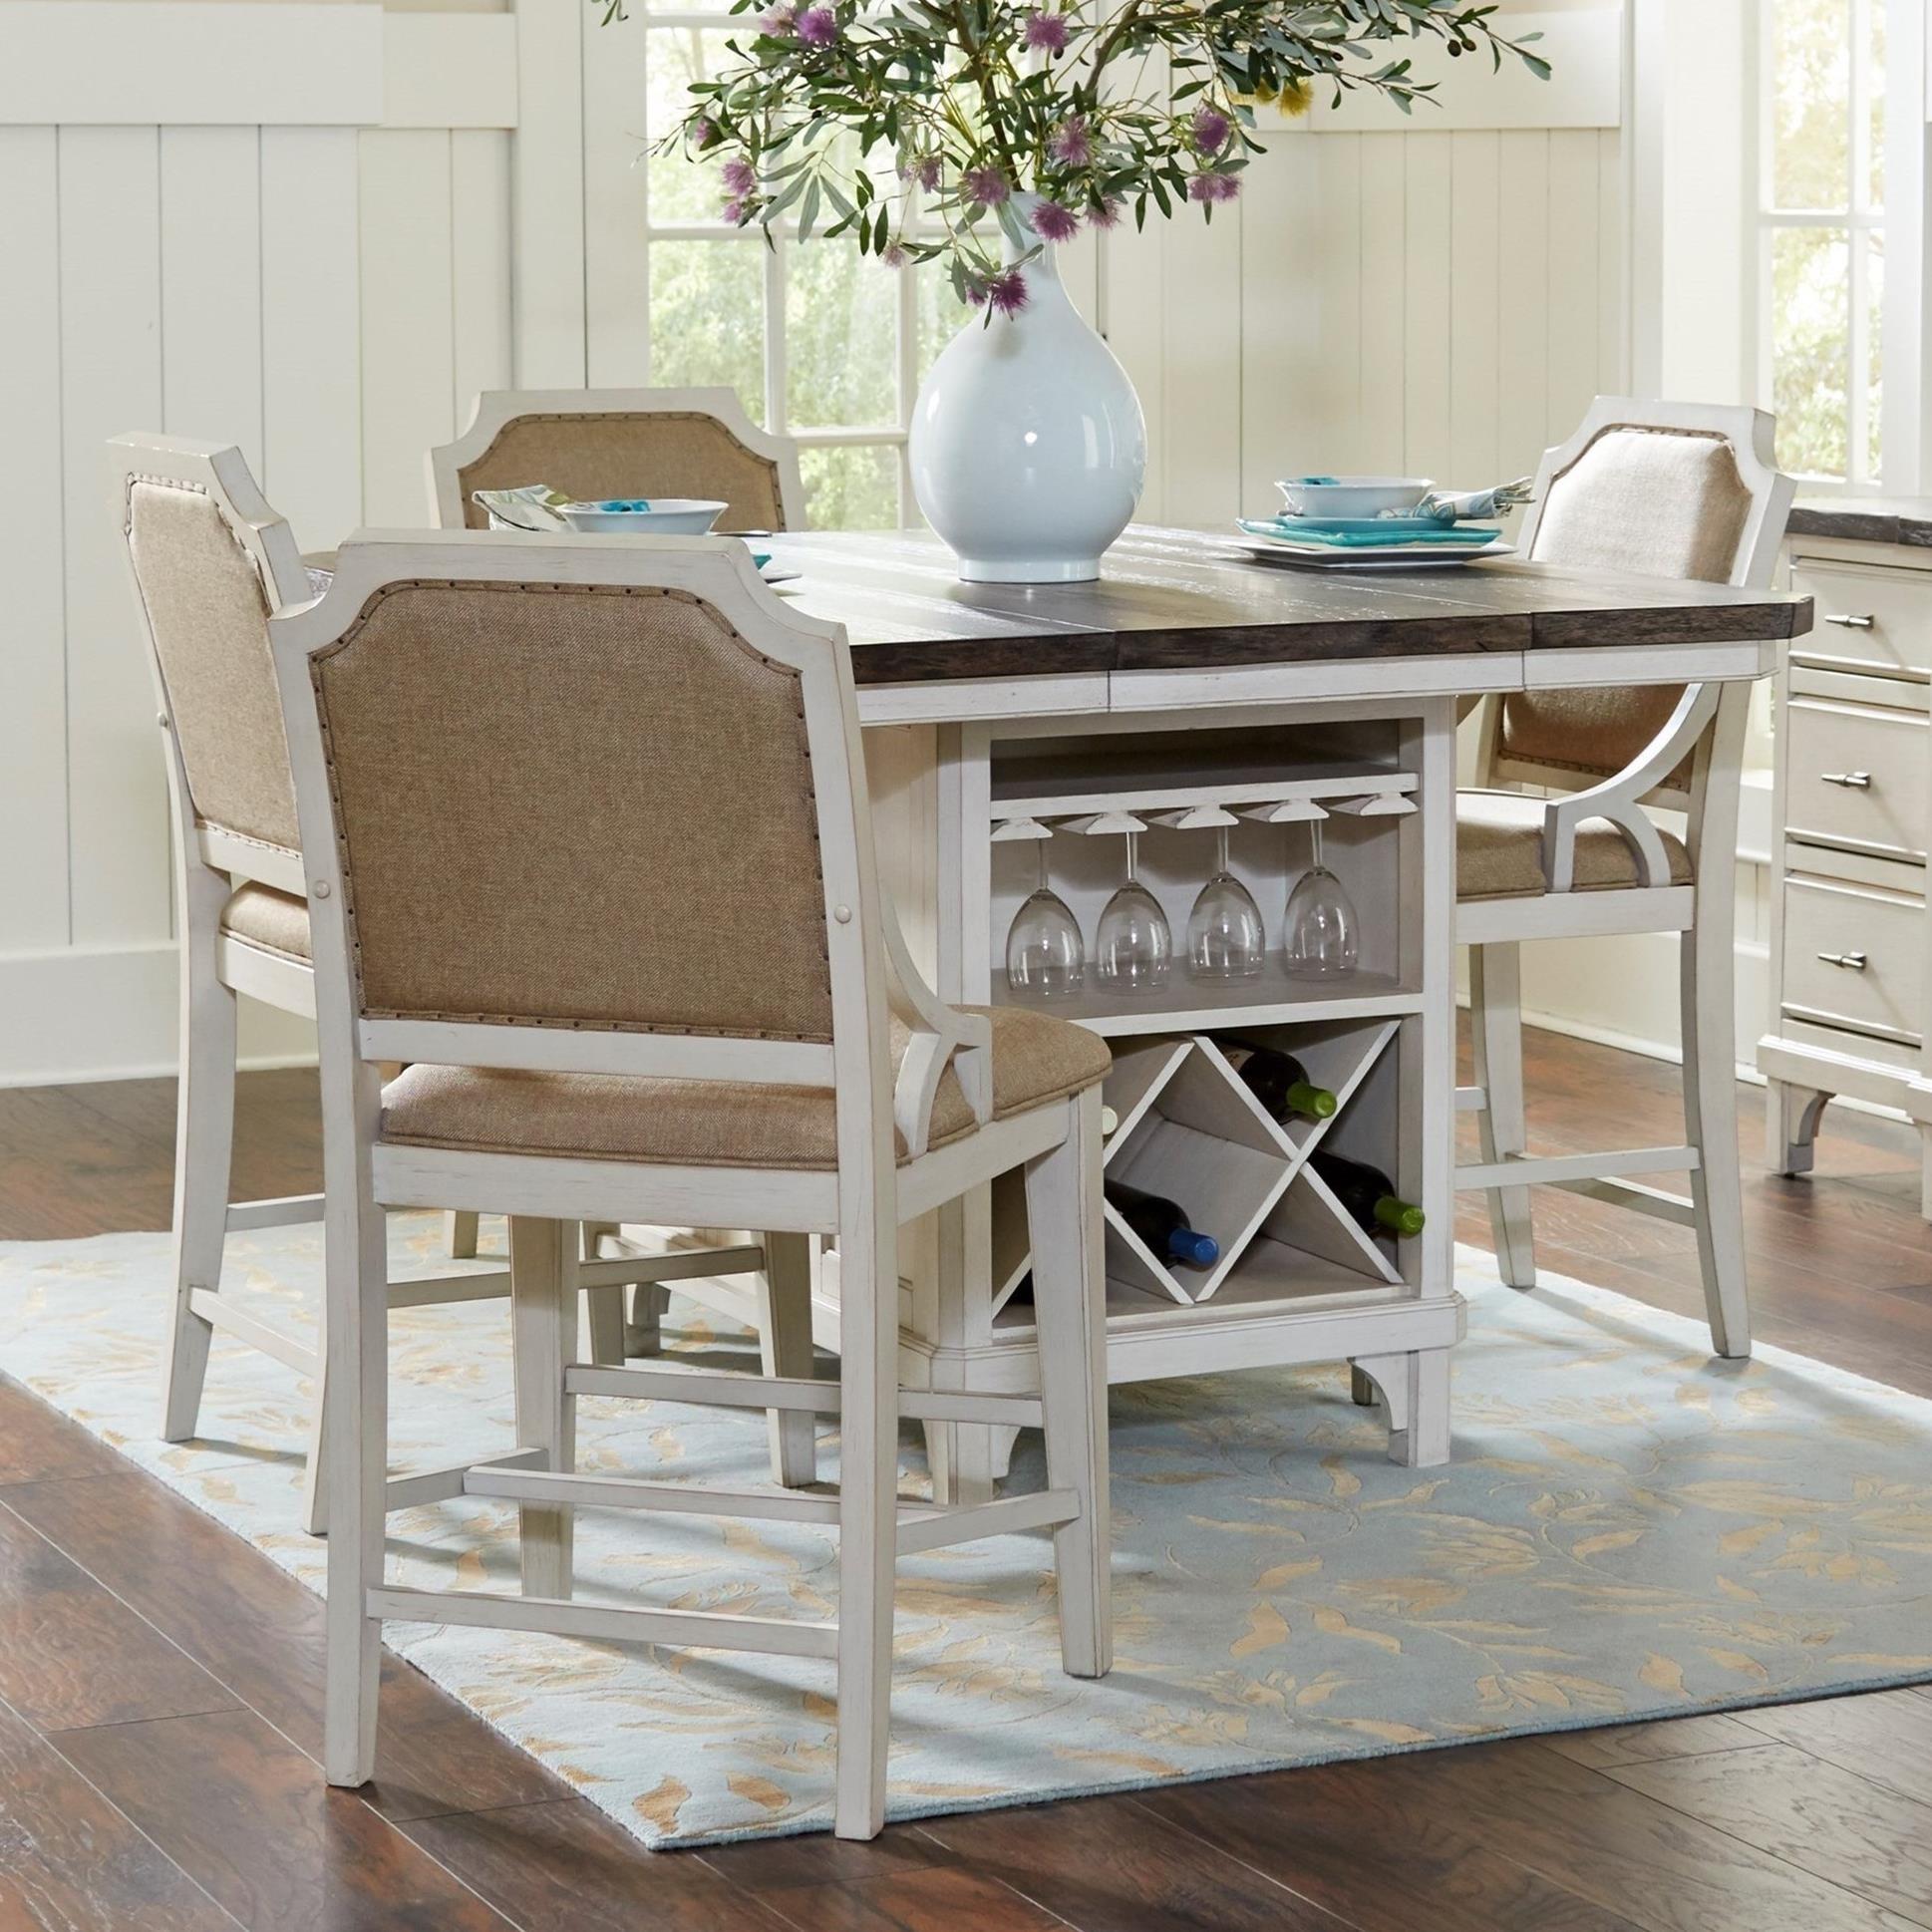 Avalon Furniture Mystic Cay 5 Piece Kitchen Island Table